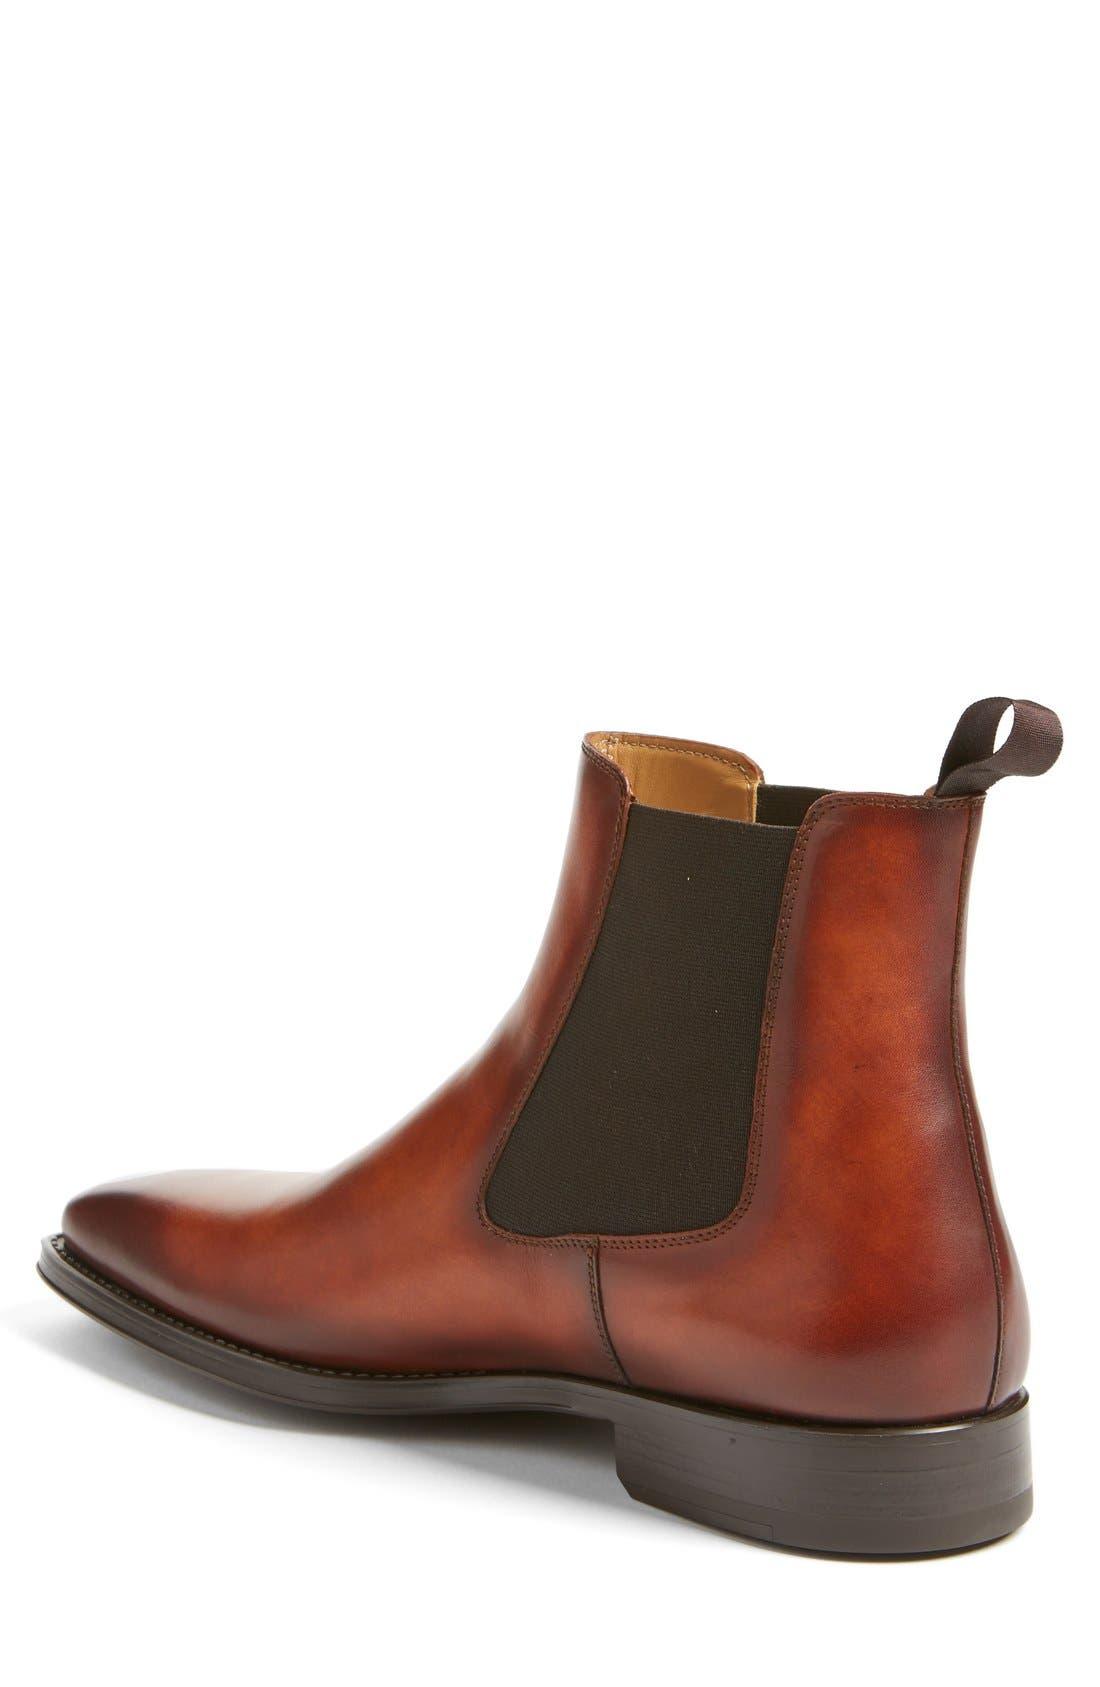 'Sean' Chelsea Boot,                             Alternate thumbnail 2, color,                             Cognac